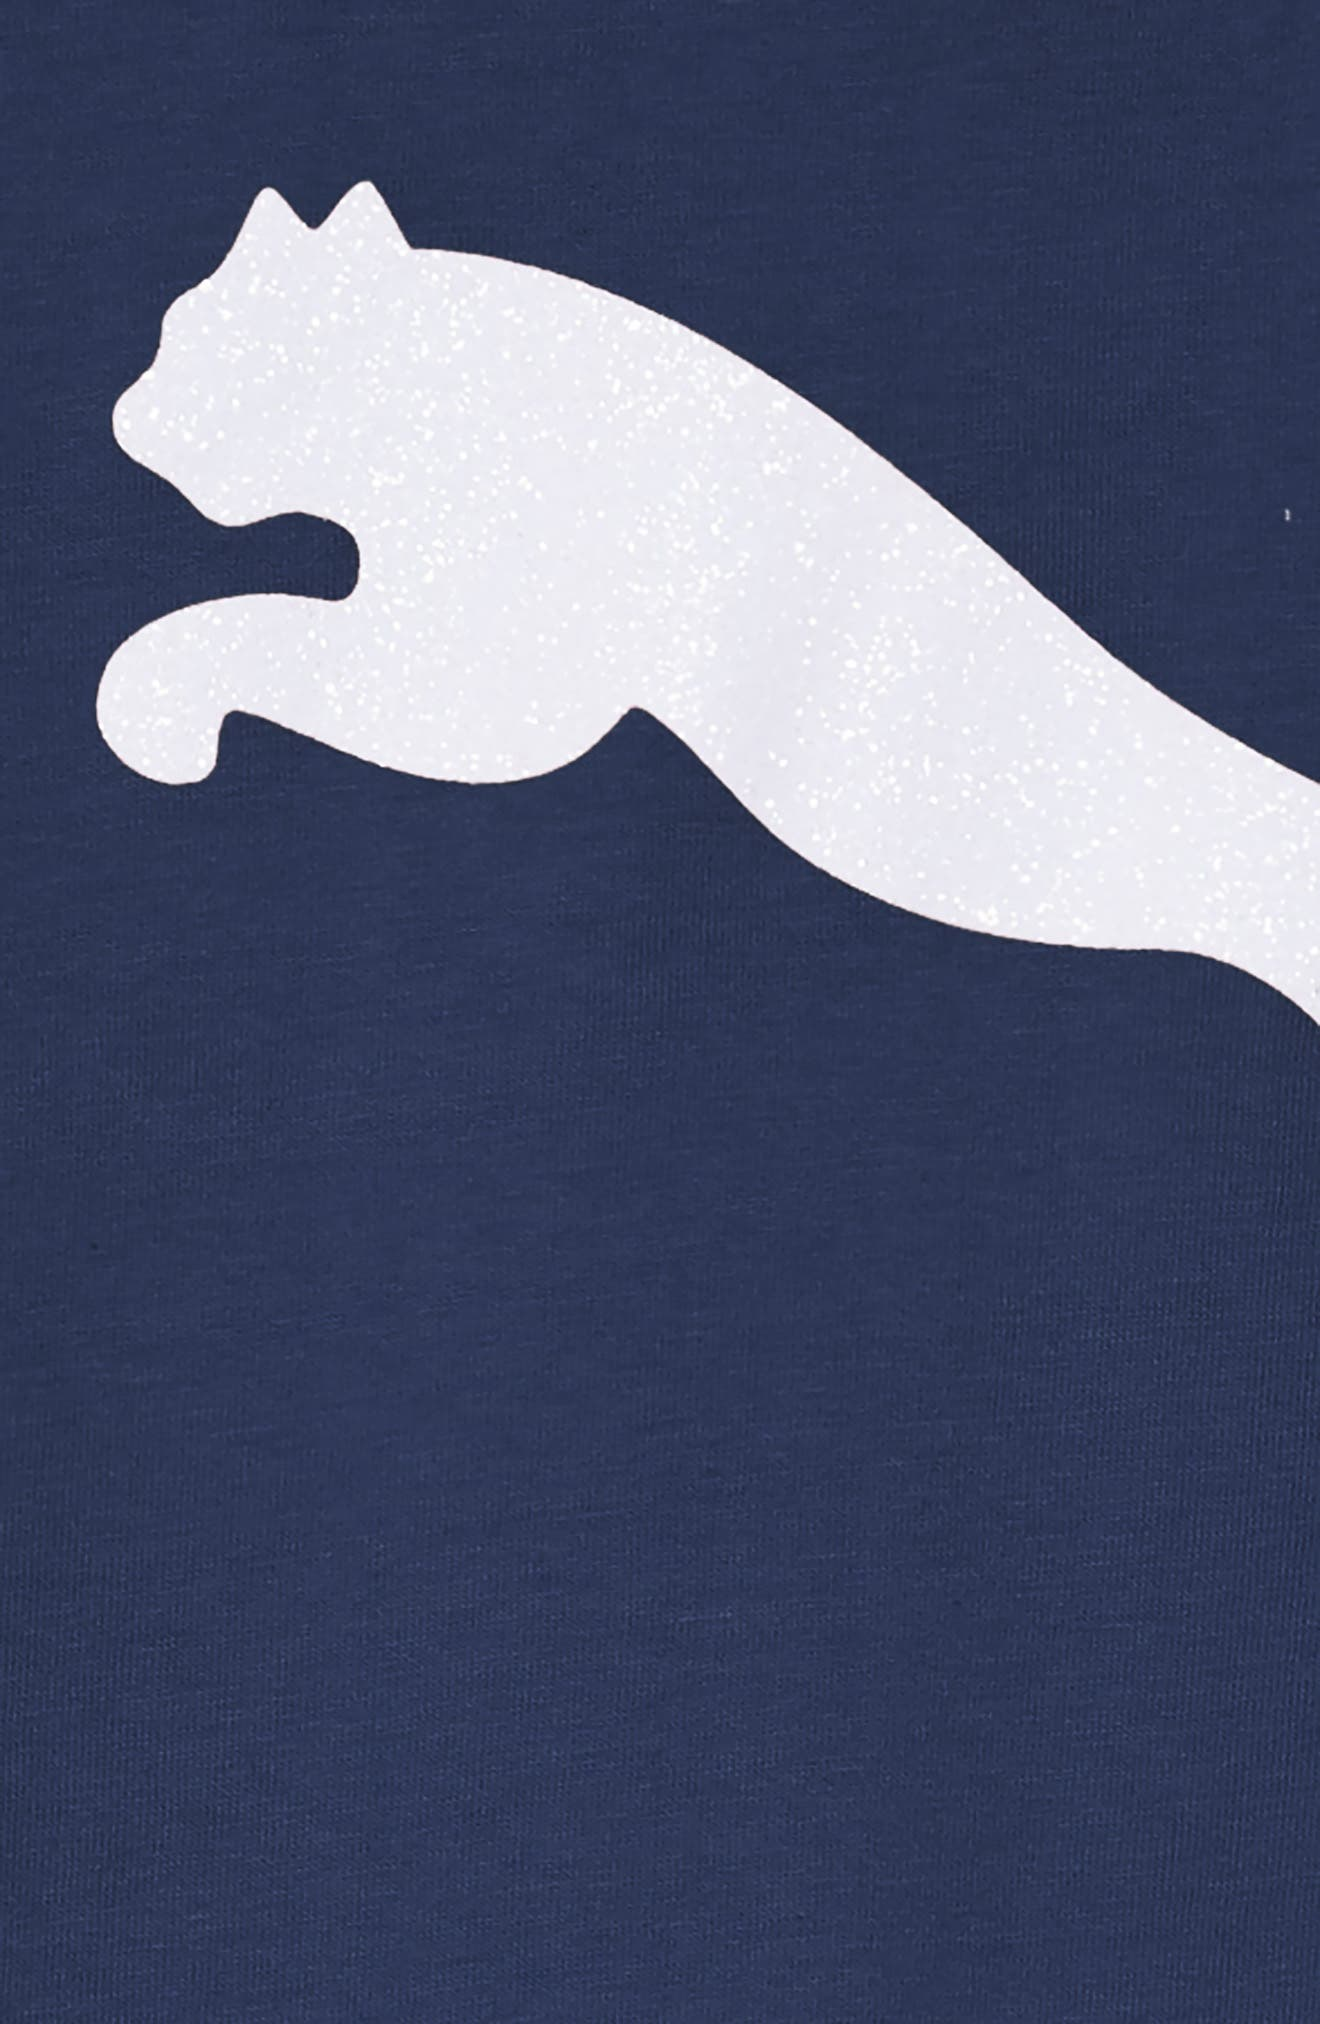 PUMA,                             Logo T-Shirt Dress,                             Alternate thumbnail 3, color,                             404